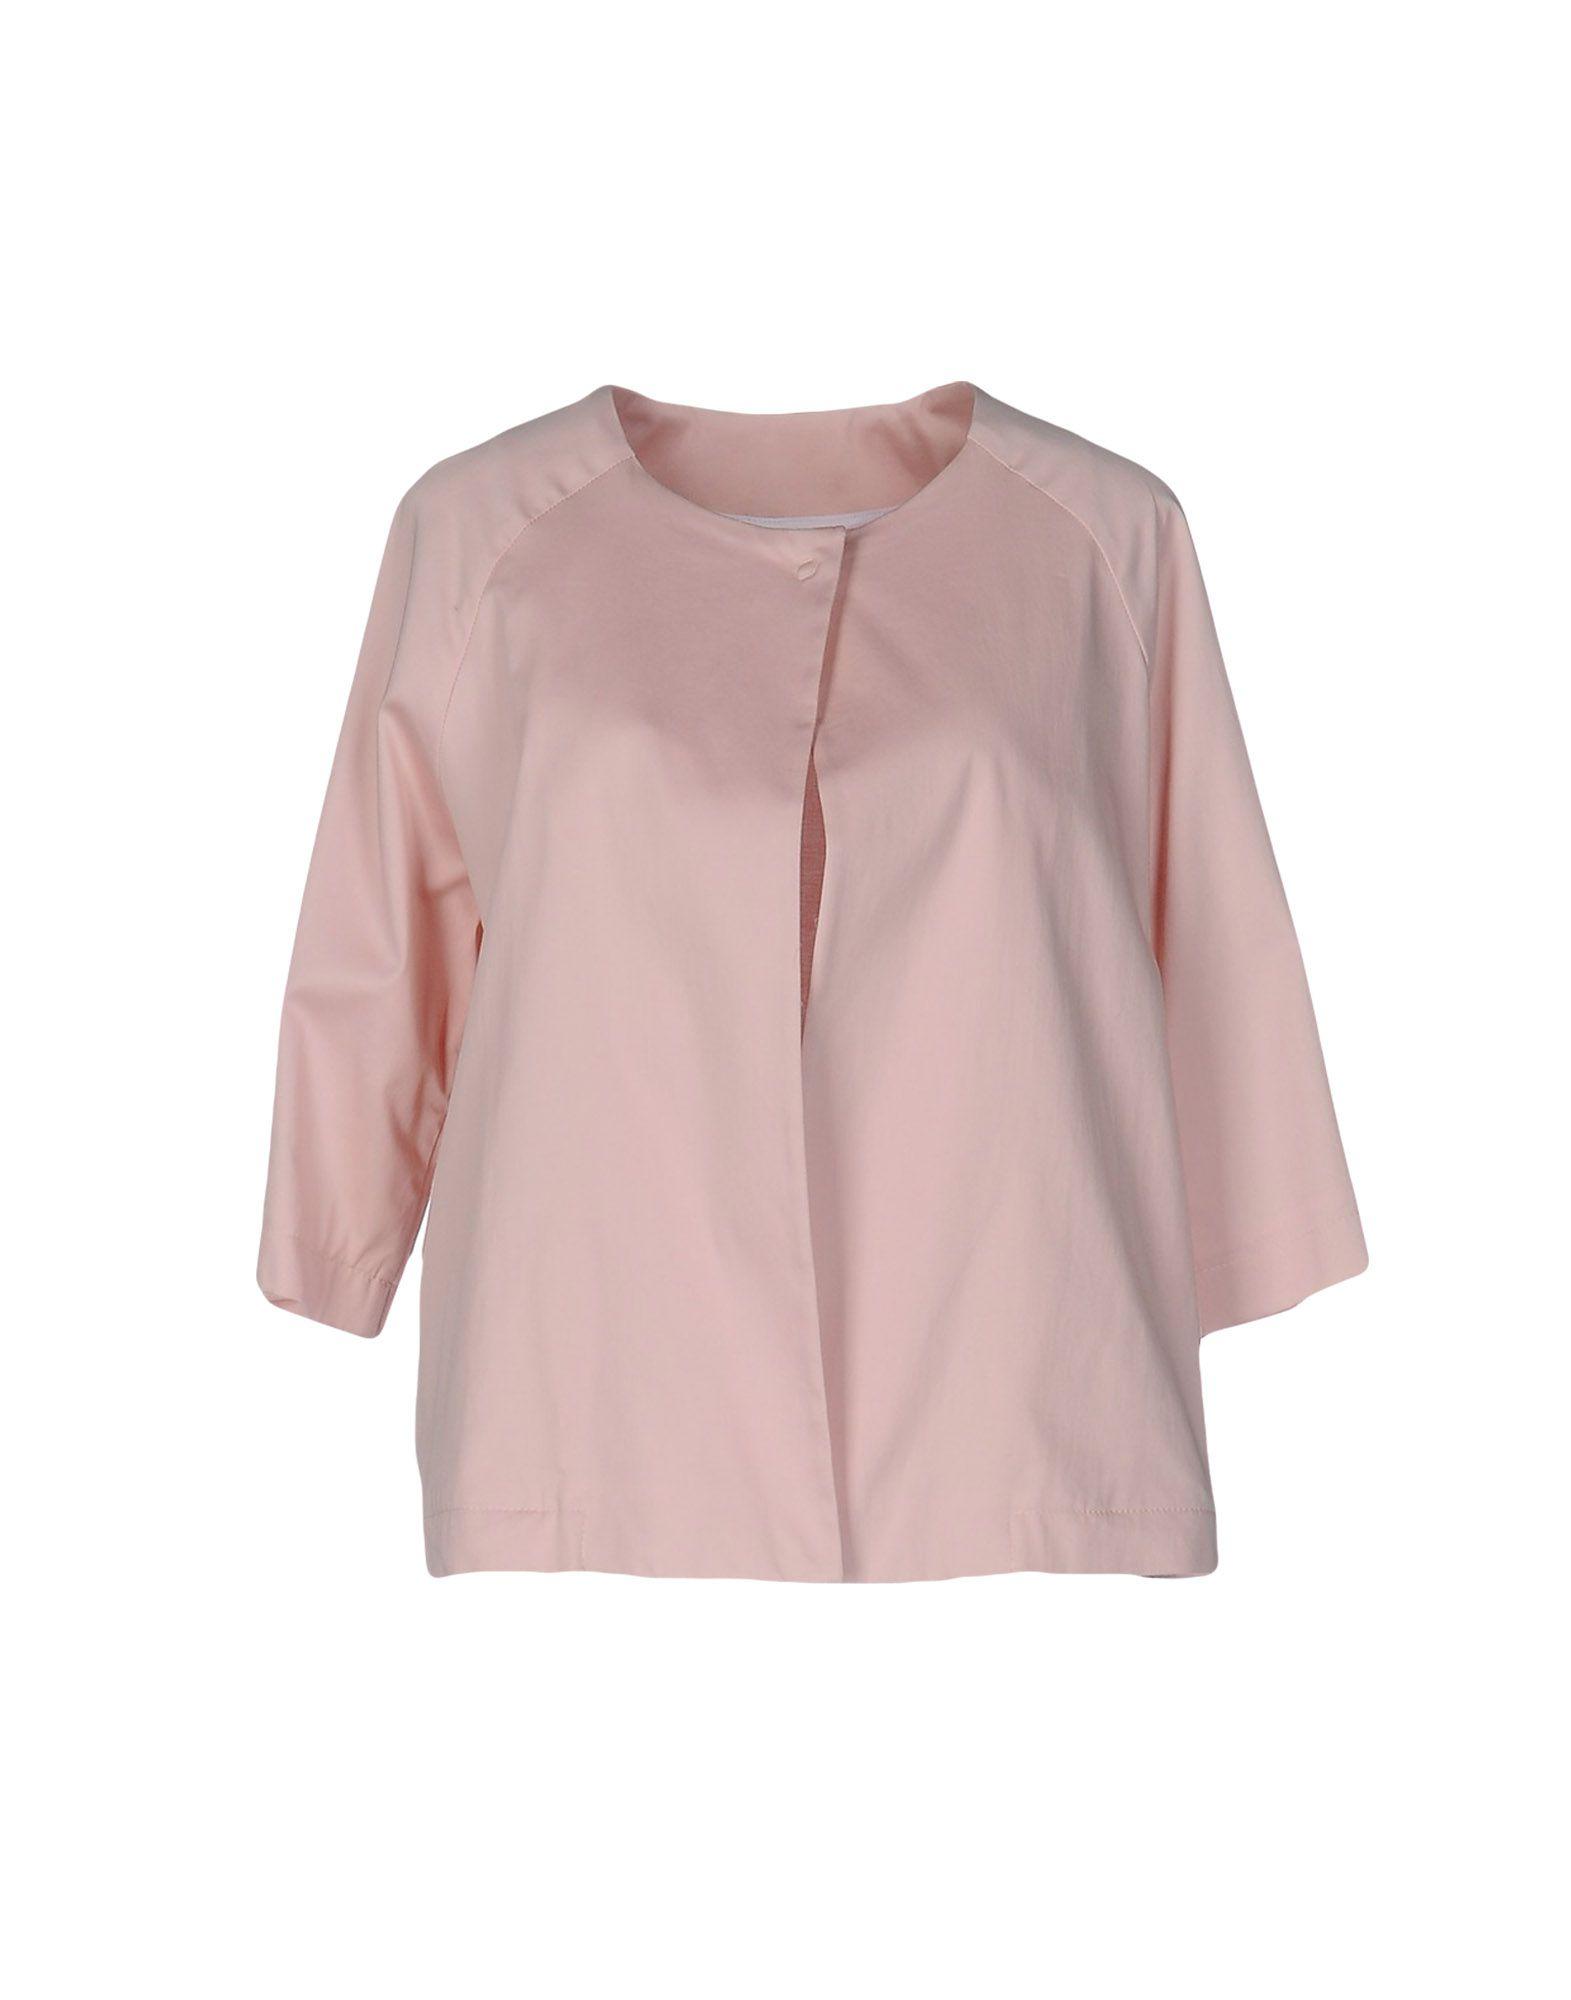 GUTTHA Damen Jackett Farbe Rosa Größe 6 jetztbilligerkaufen